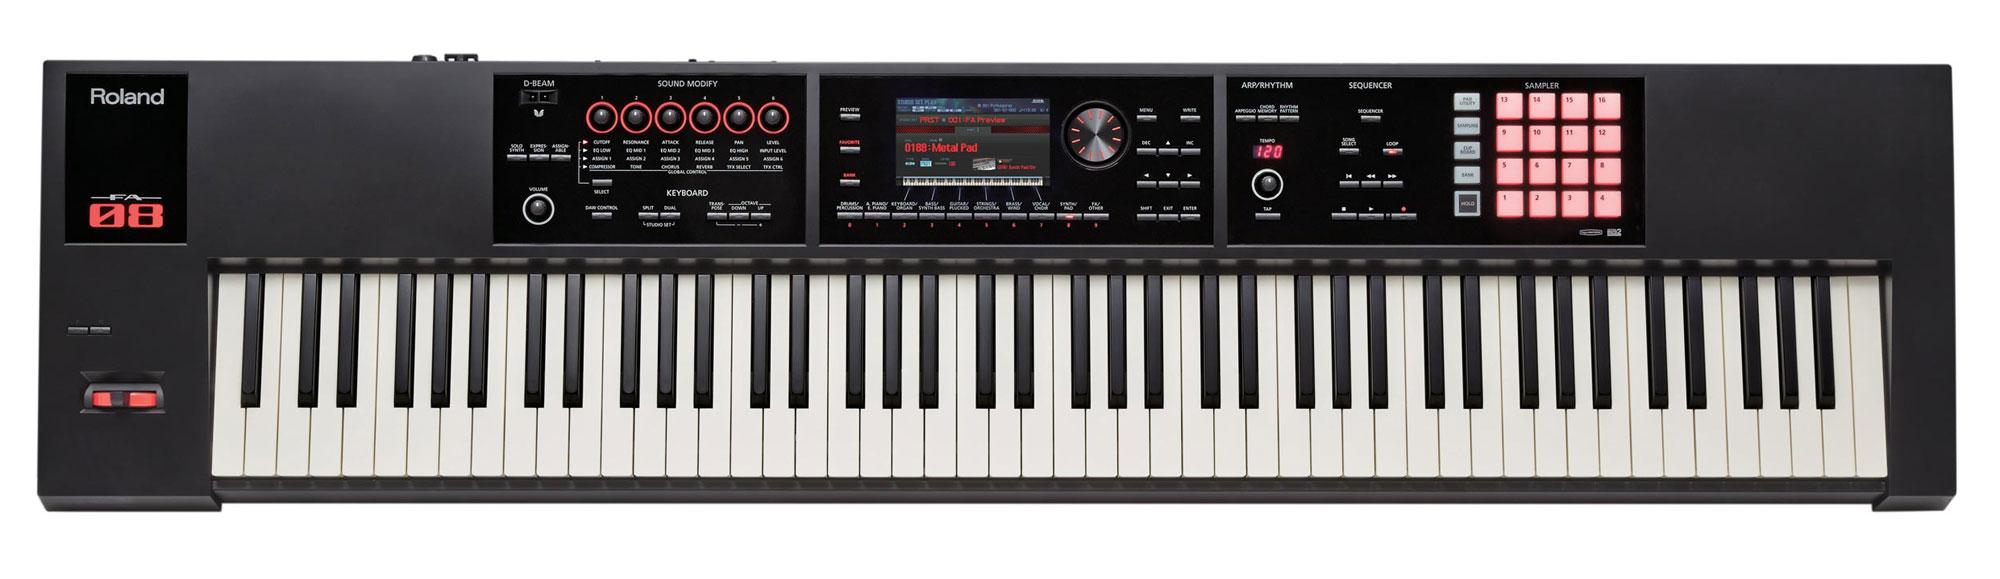 Roland FA 08 Synthesizer Workstation 88 Tasten Ivory Feel